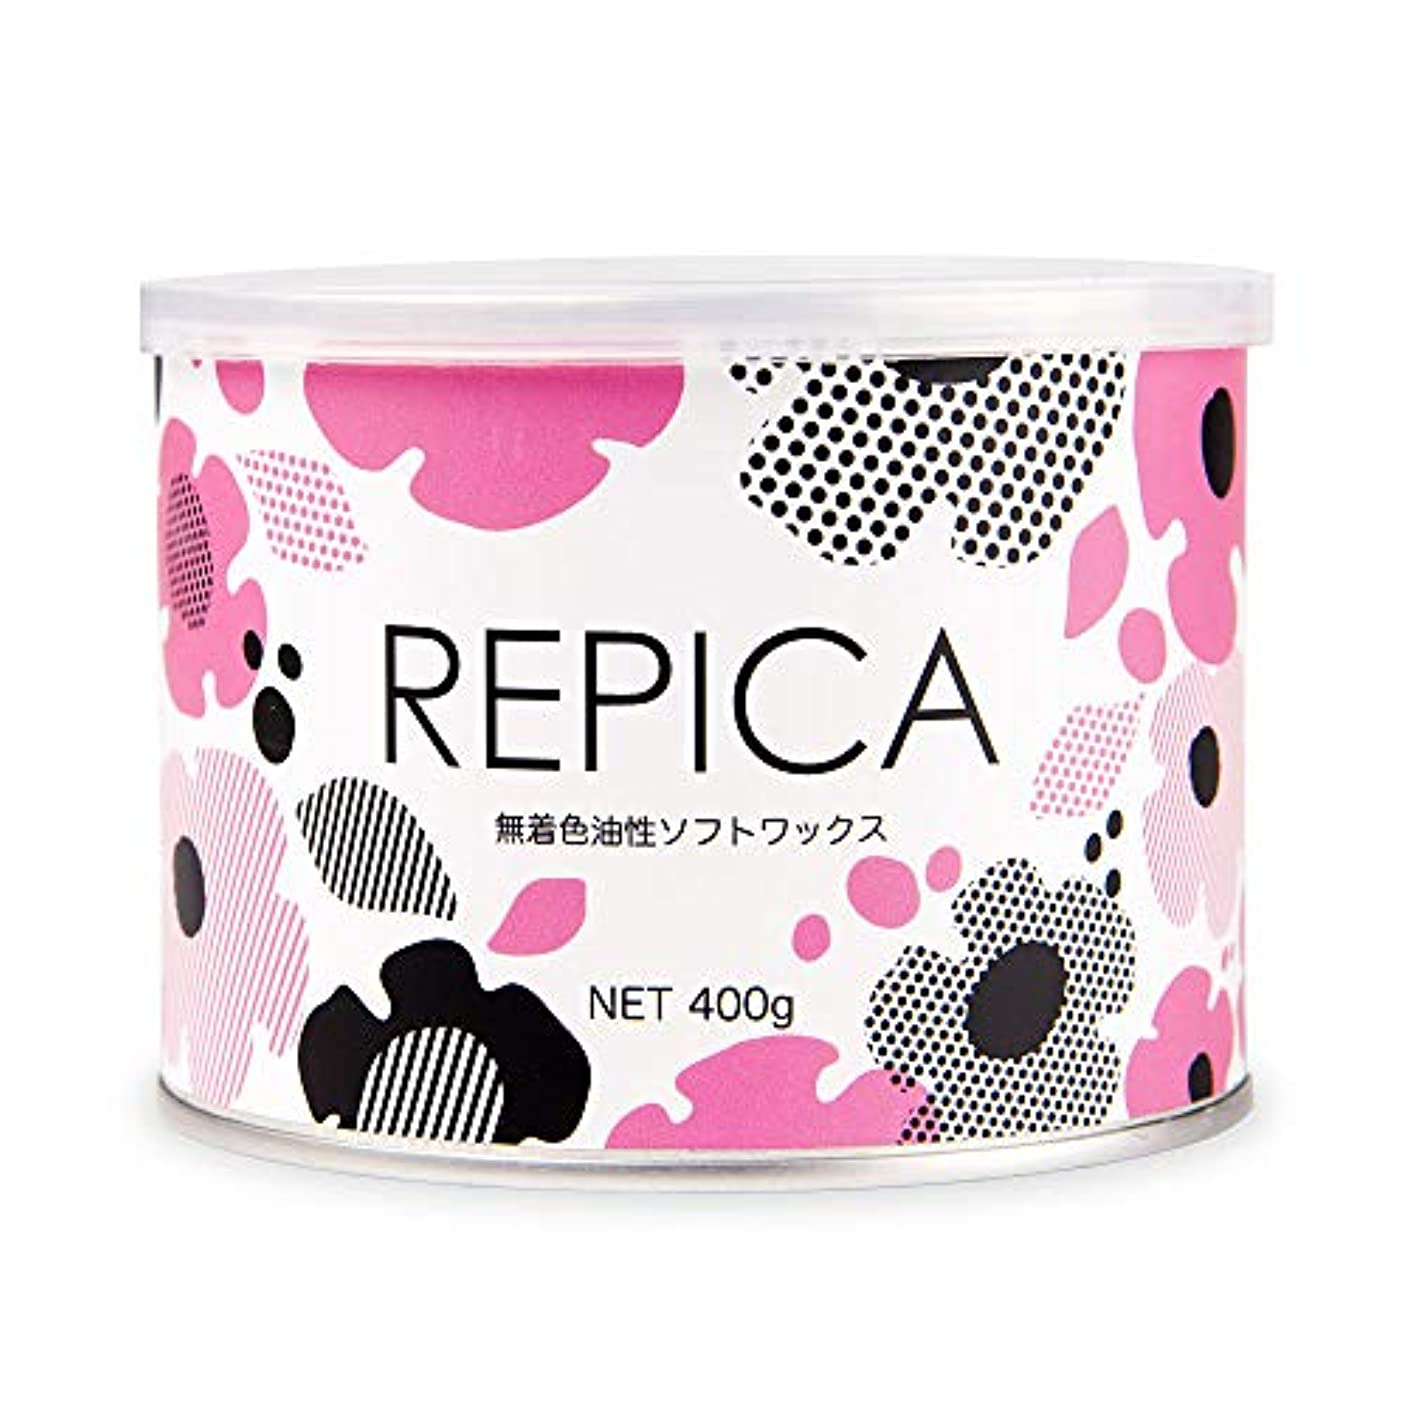 REPICA 無着色油性ソフトワックス 400ml ブラジリアンワックス 脱毛 ワックス脱毛 【 VIO/背中/腕/足 全身用 】 リピカ